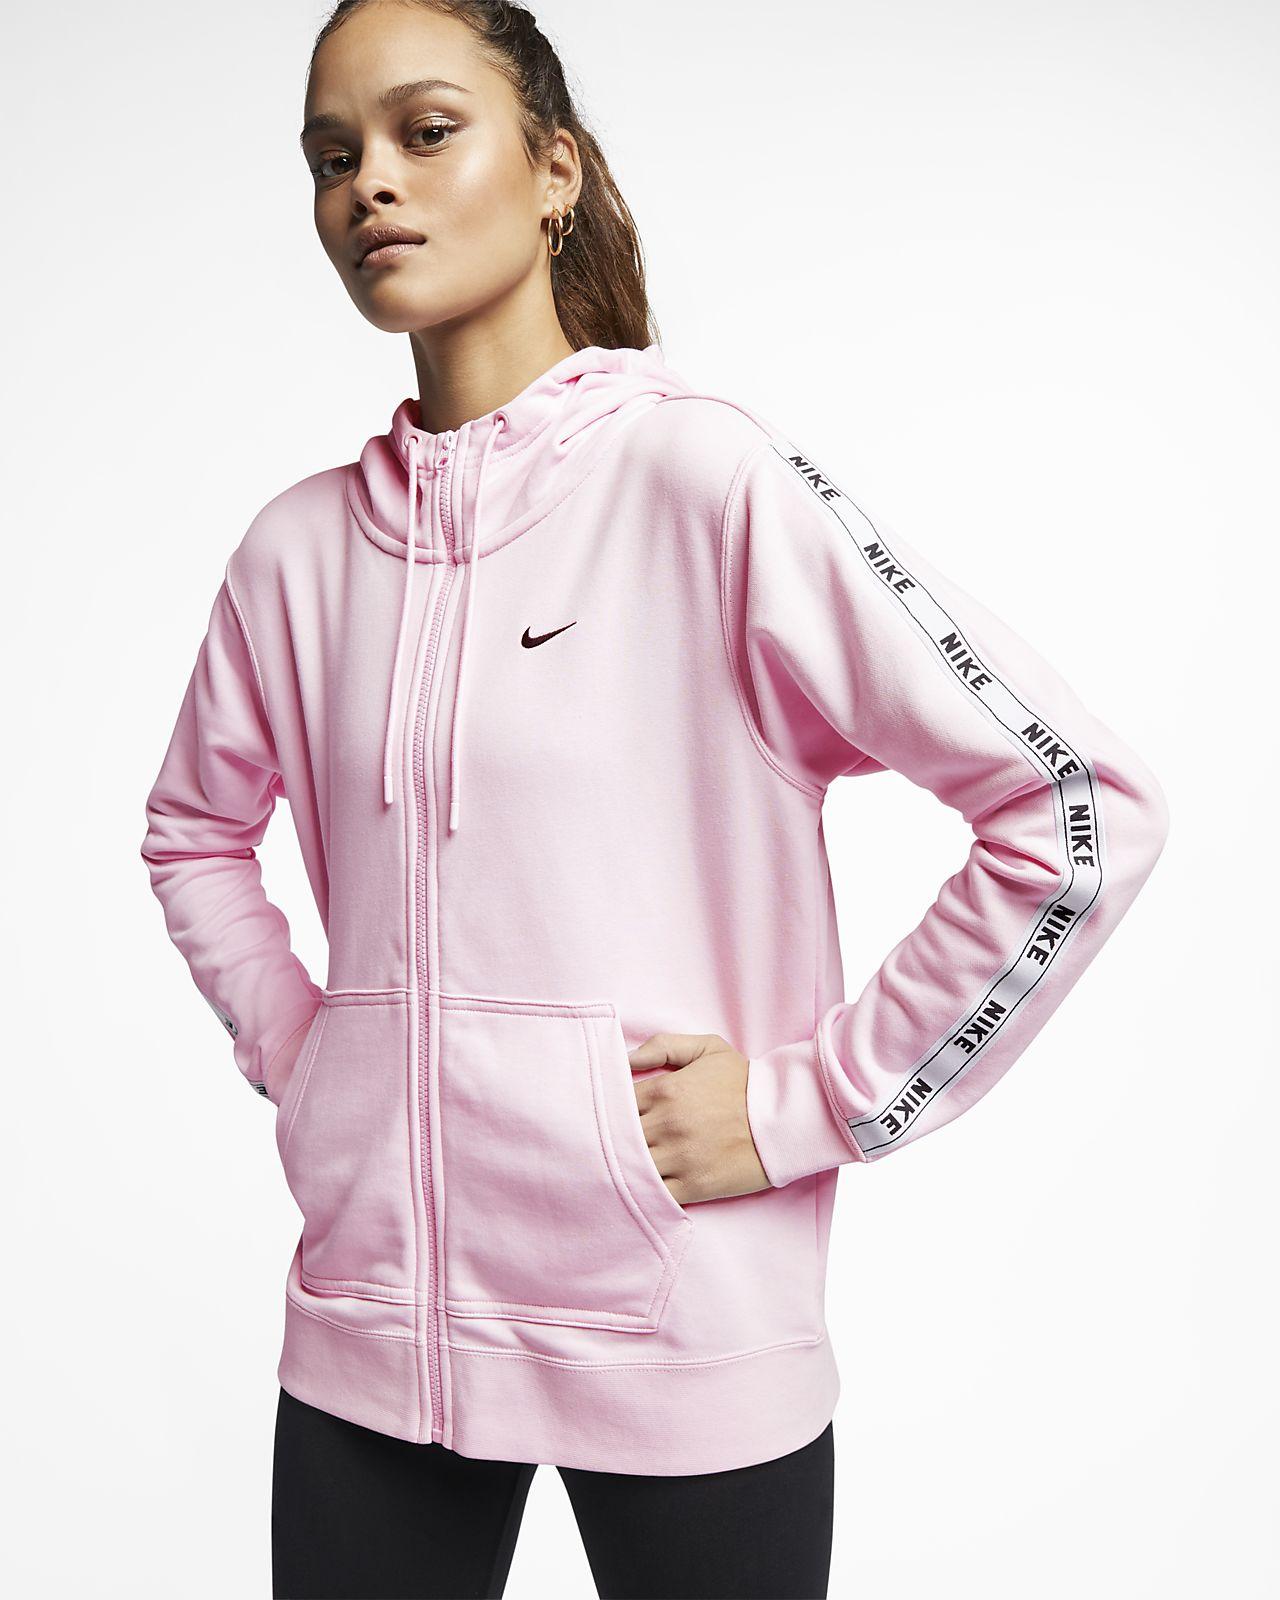 Nike Sportswear Dessuadora amb caputxa, cremallera completa i logotip - Dona